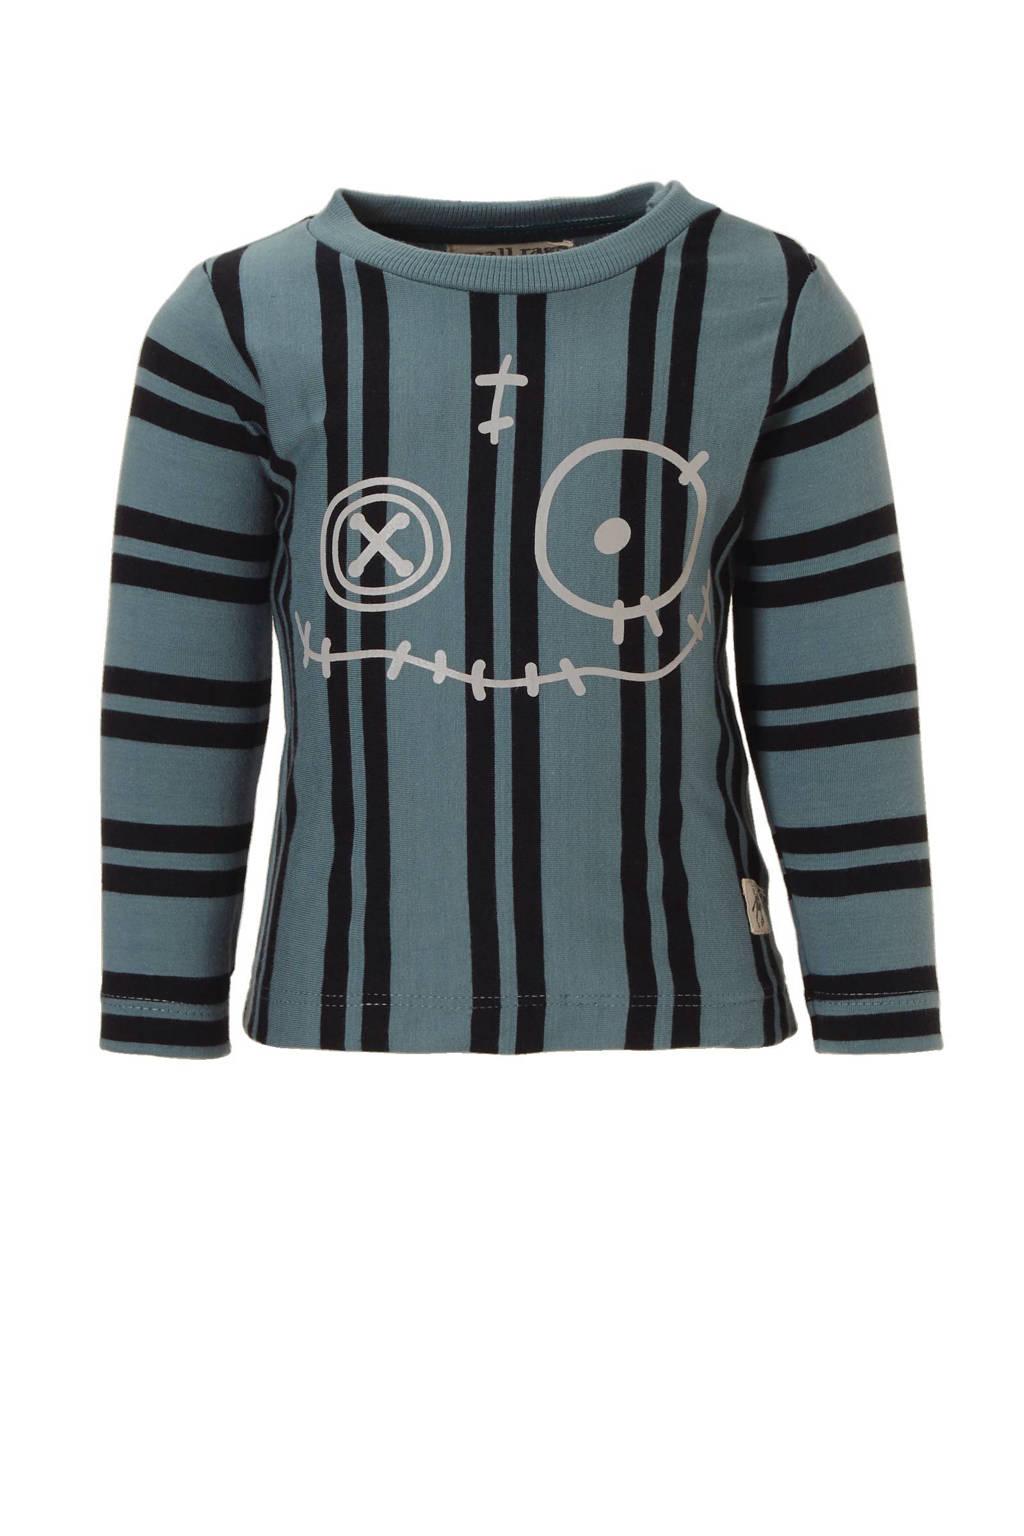 Small Rags T-shirt Hubert, Grijsblauw/ zwart/ grijs